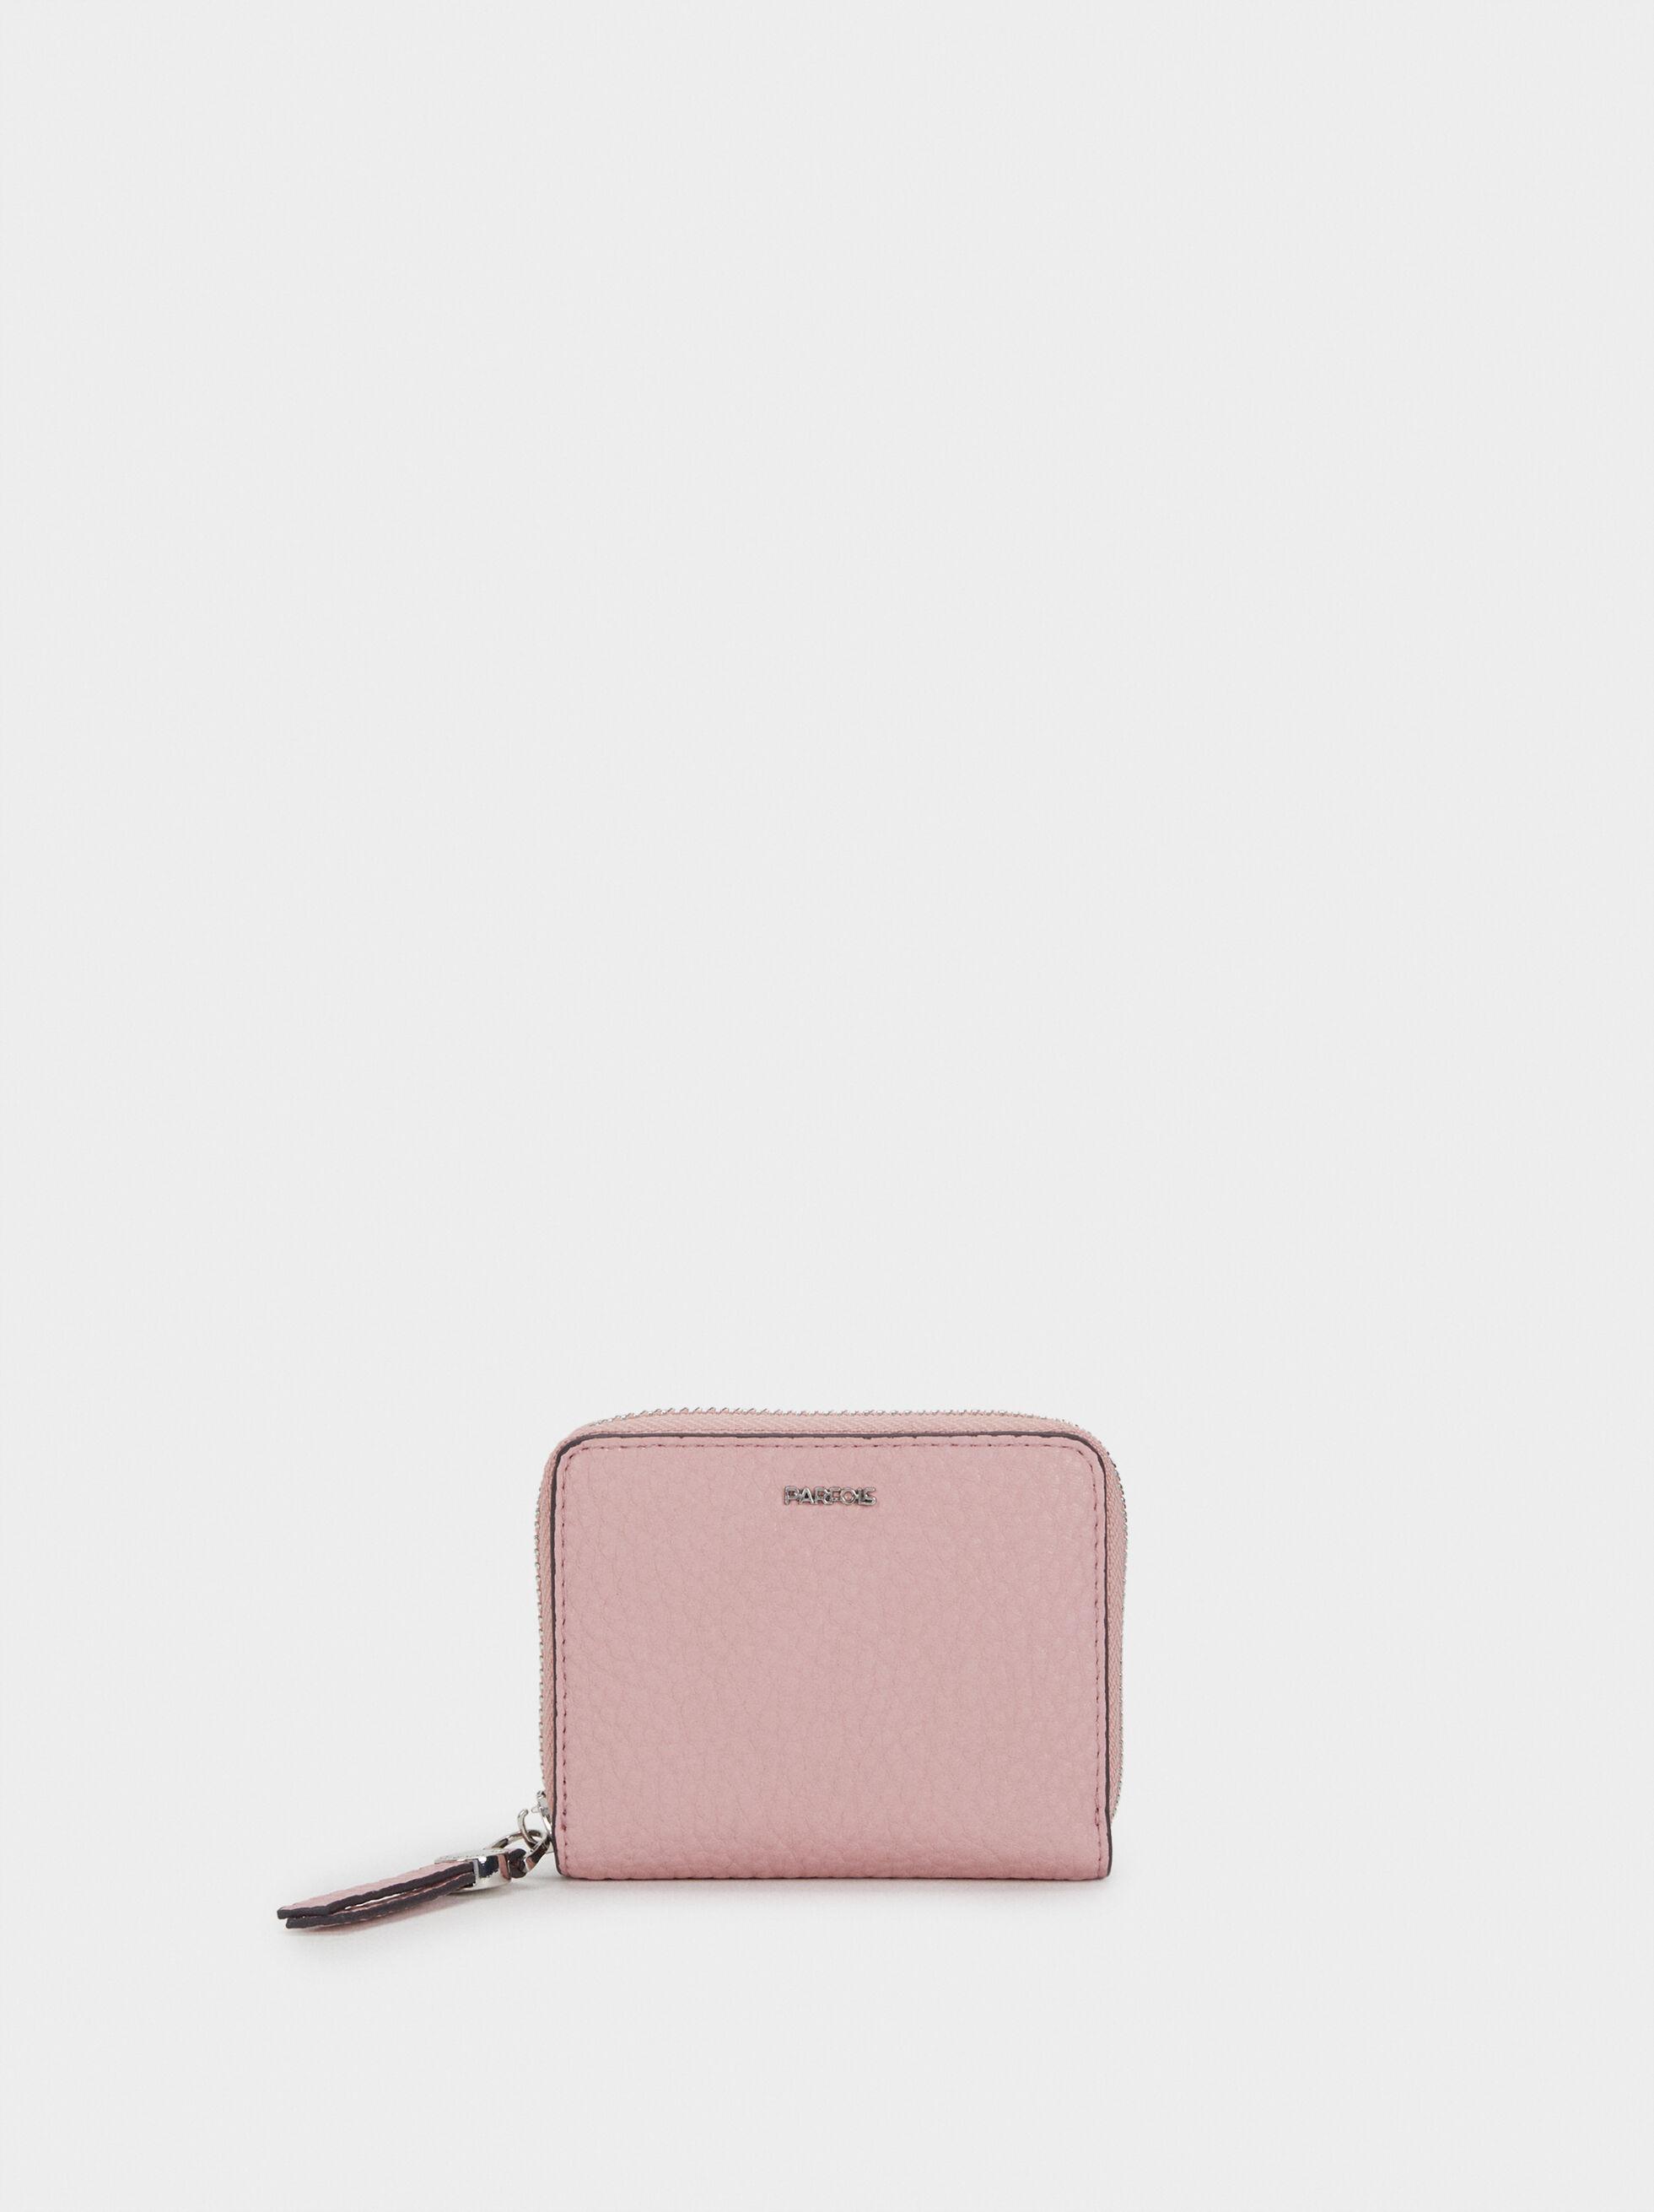 Medium Textured Card Holder, Pink, hi-res